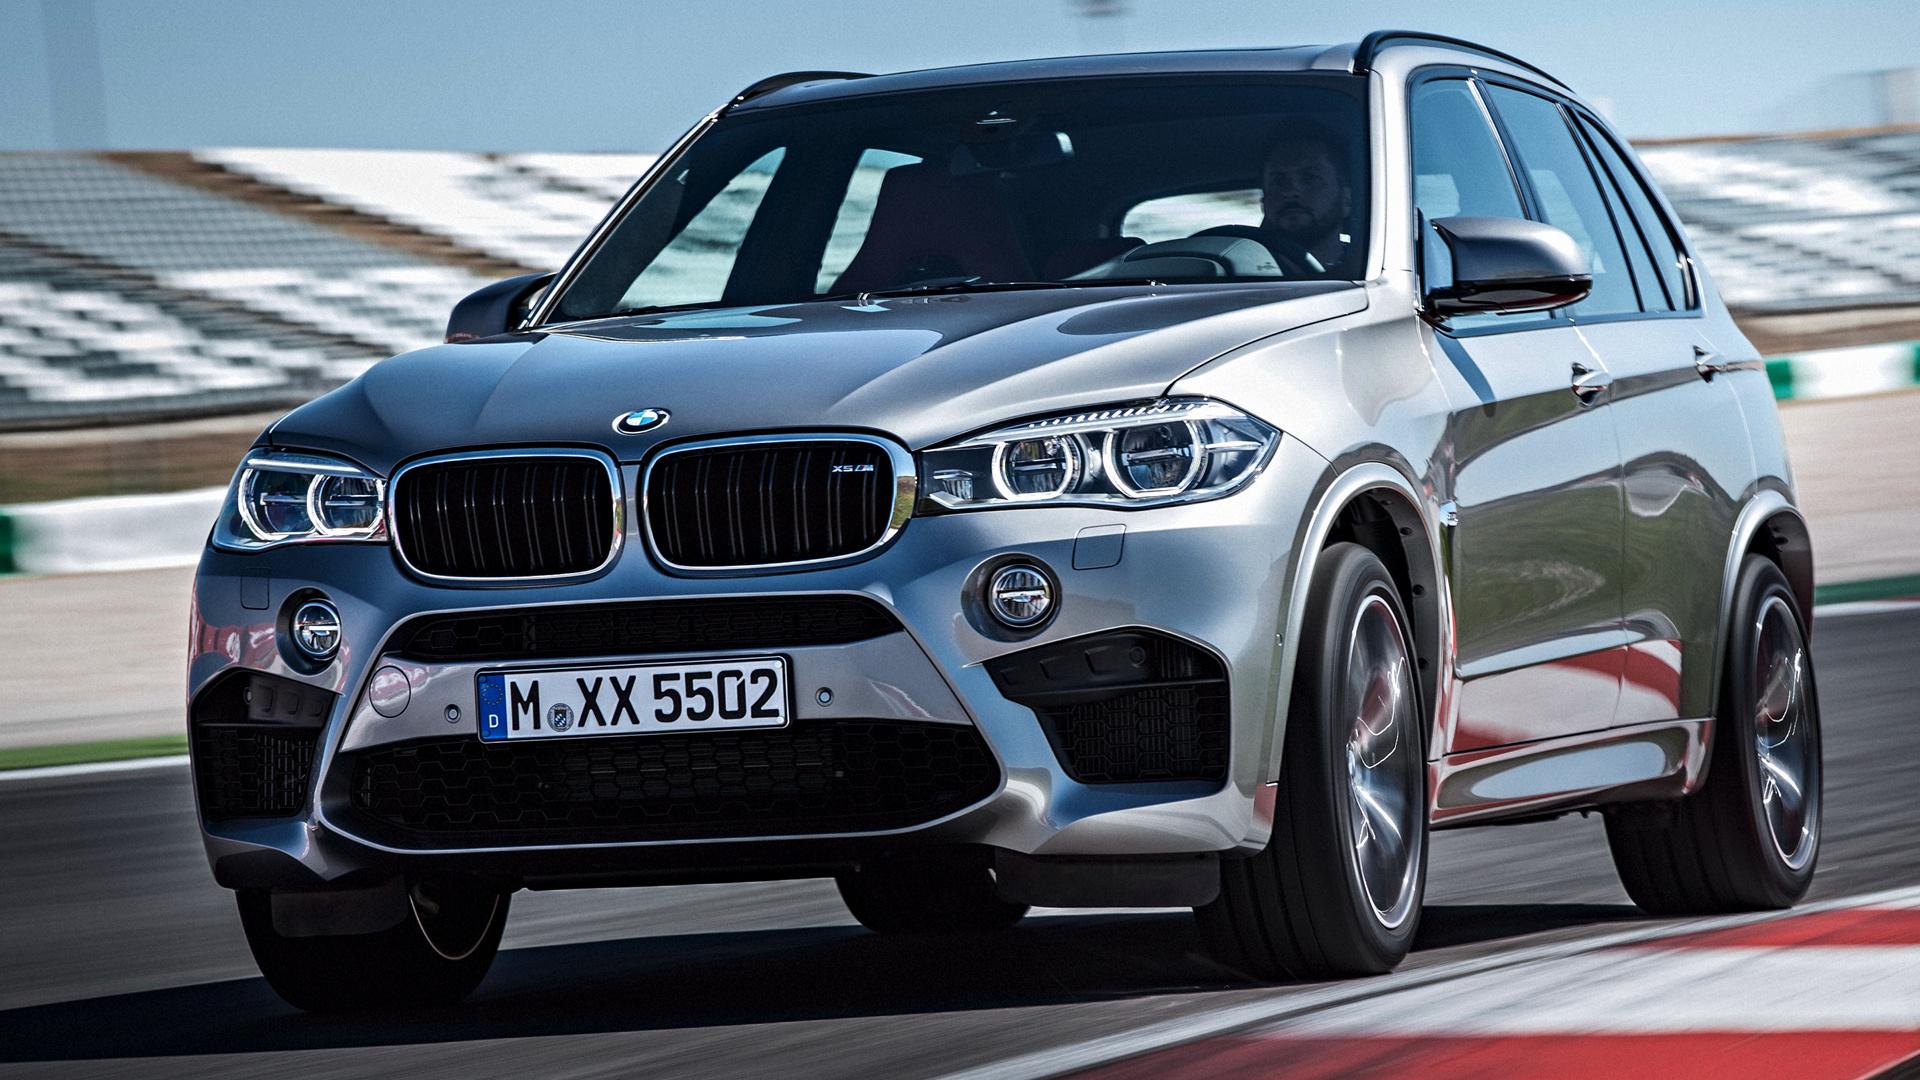 BMW X5 Wallpapers - WallpaperSafari